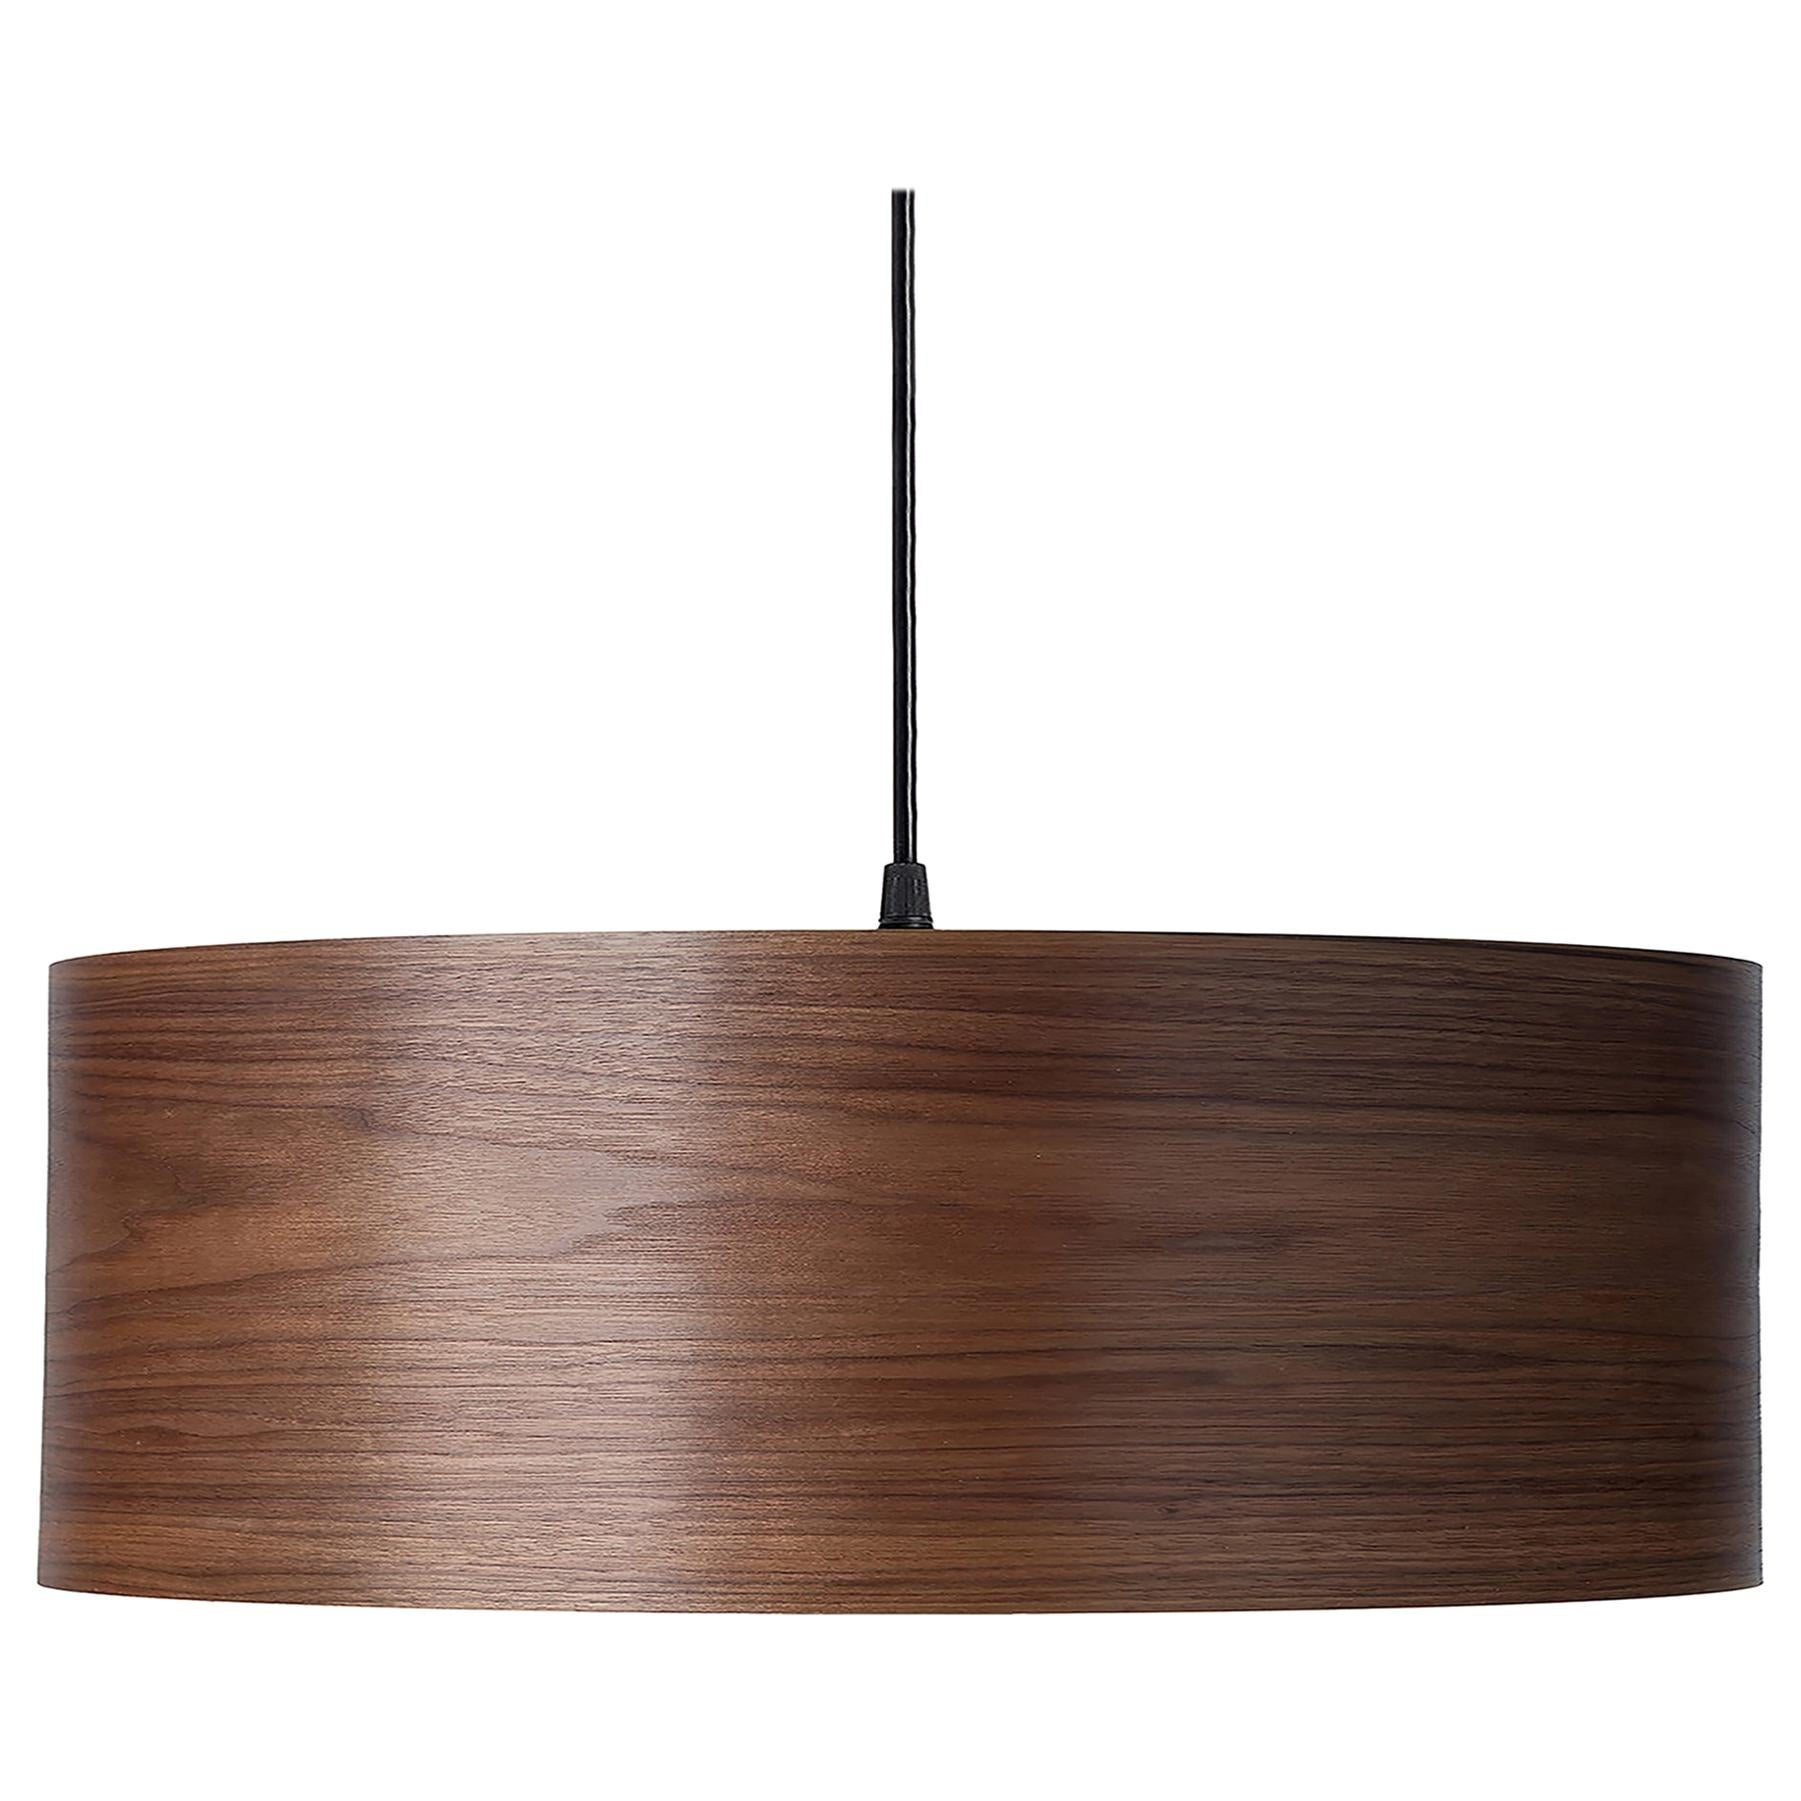 ARA Grande Walnut Wood Drum Chandelier Pendant